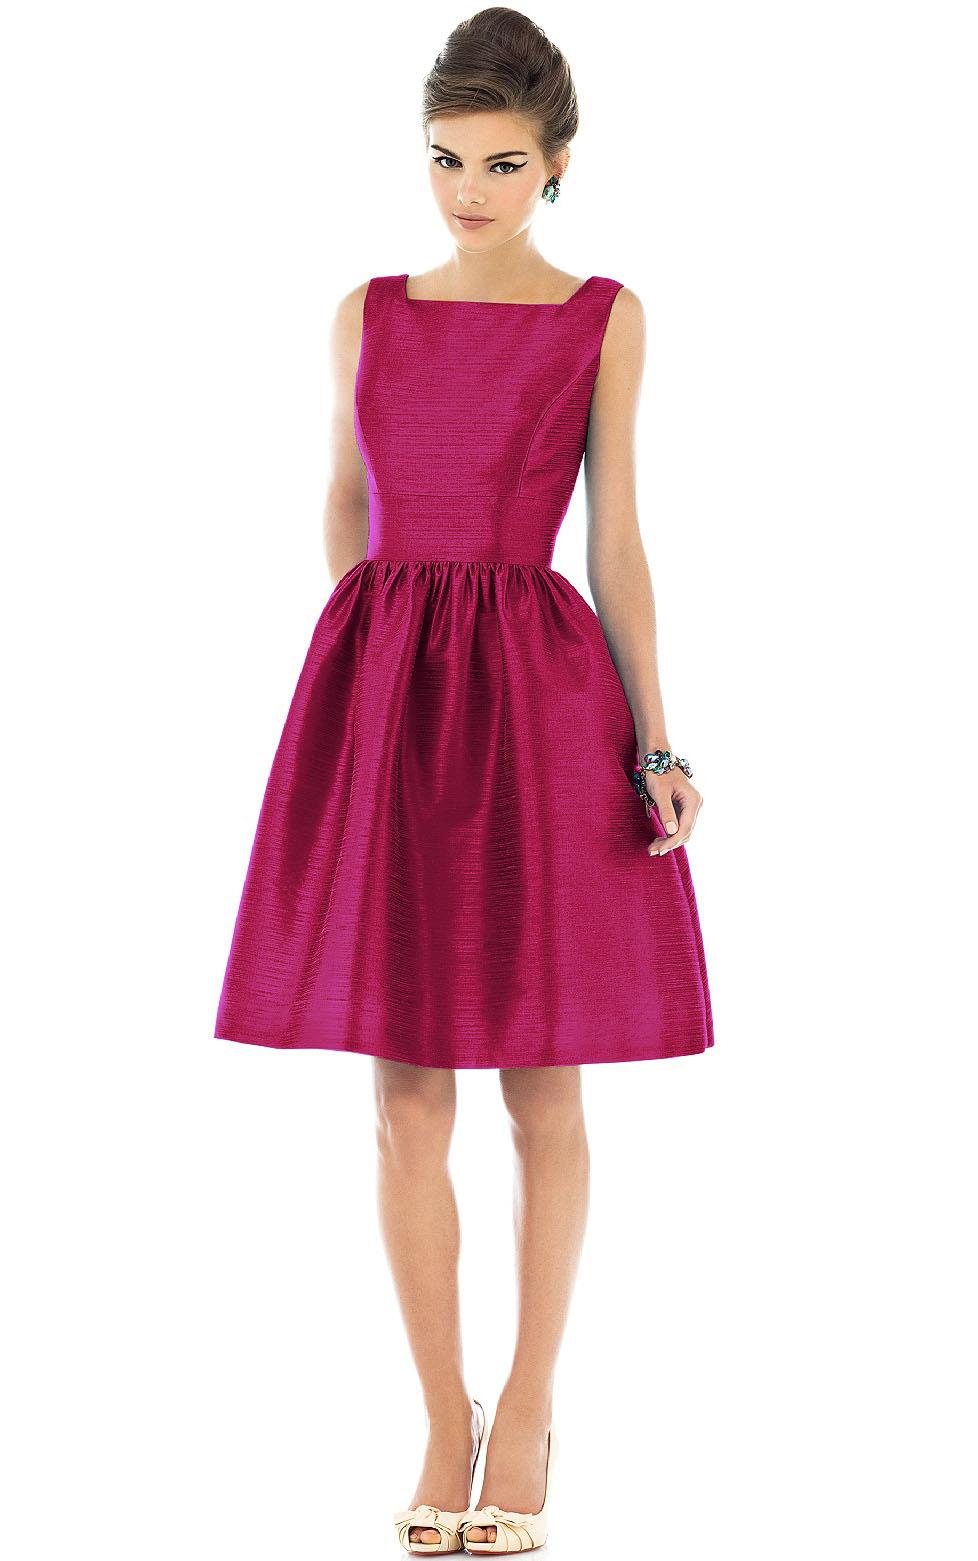 http://www.aislestyle.co.uk/zipper-sleeveless-aline-natural-kneelength-bridesmaid-dresses-p-5304.html